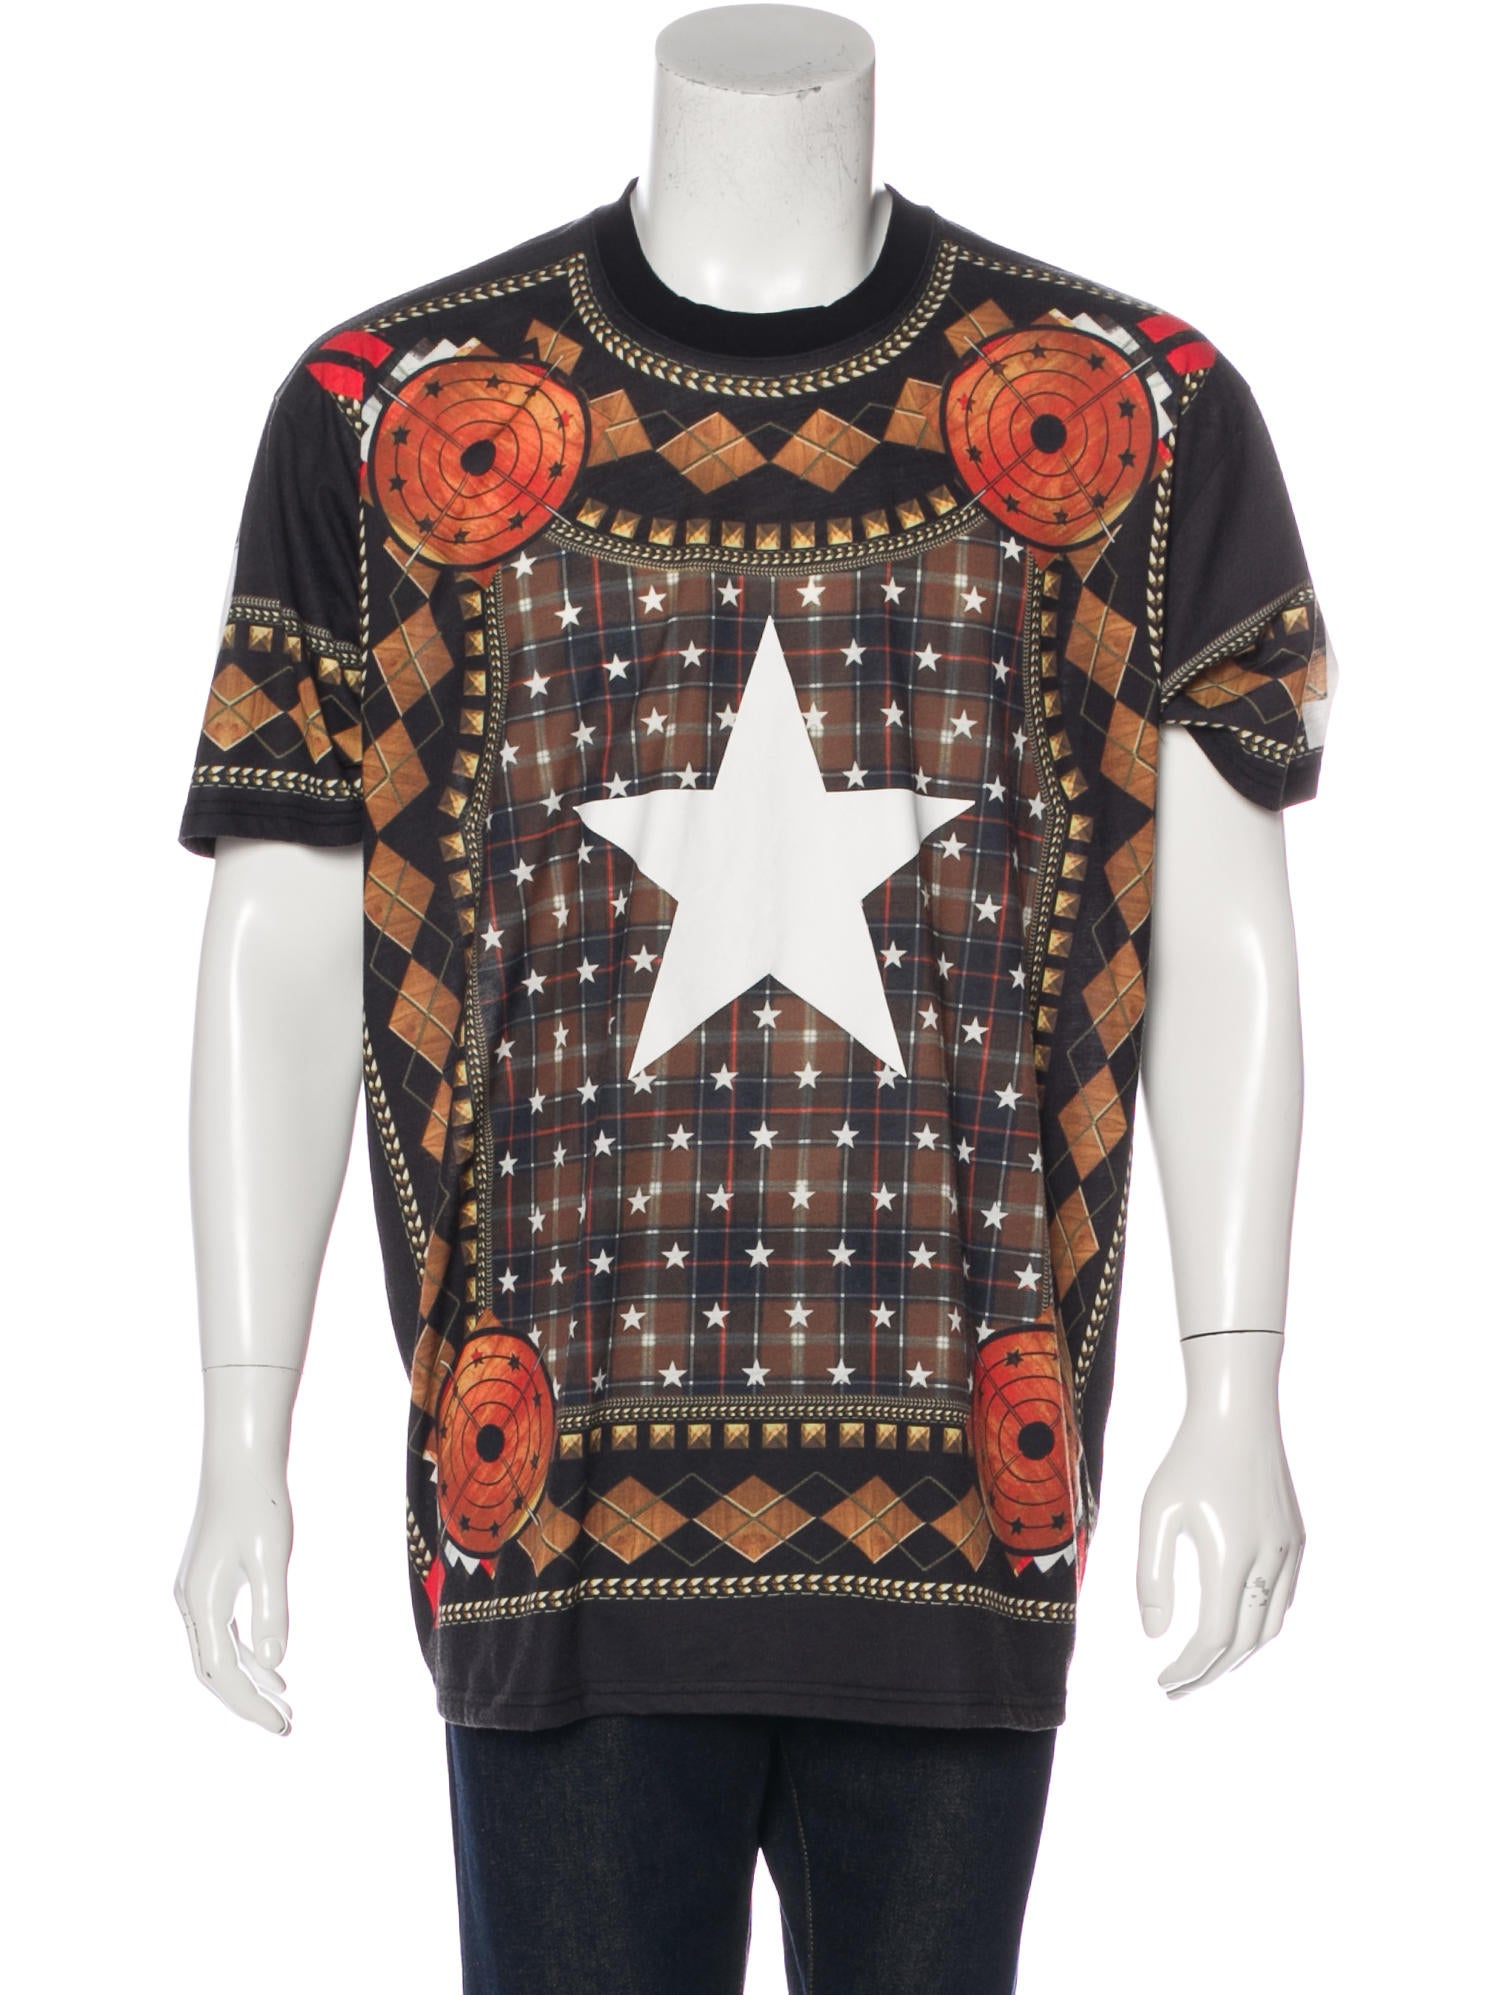 Givenchy argyle plaid star t shirt clothing giv43363 for Givenchy star t shirt